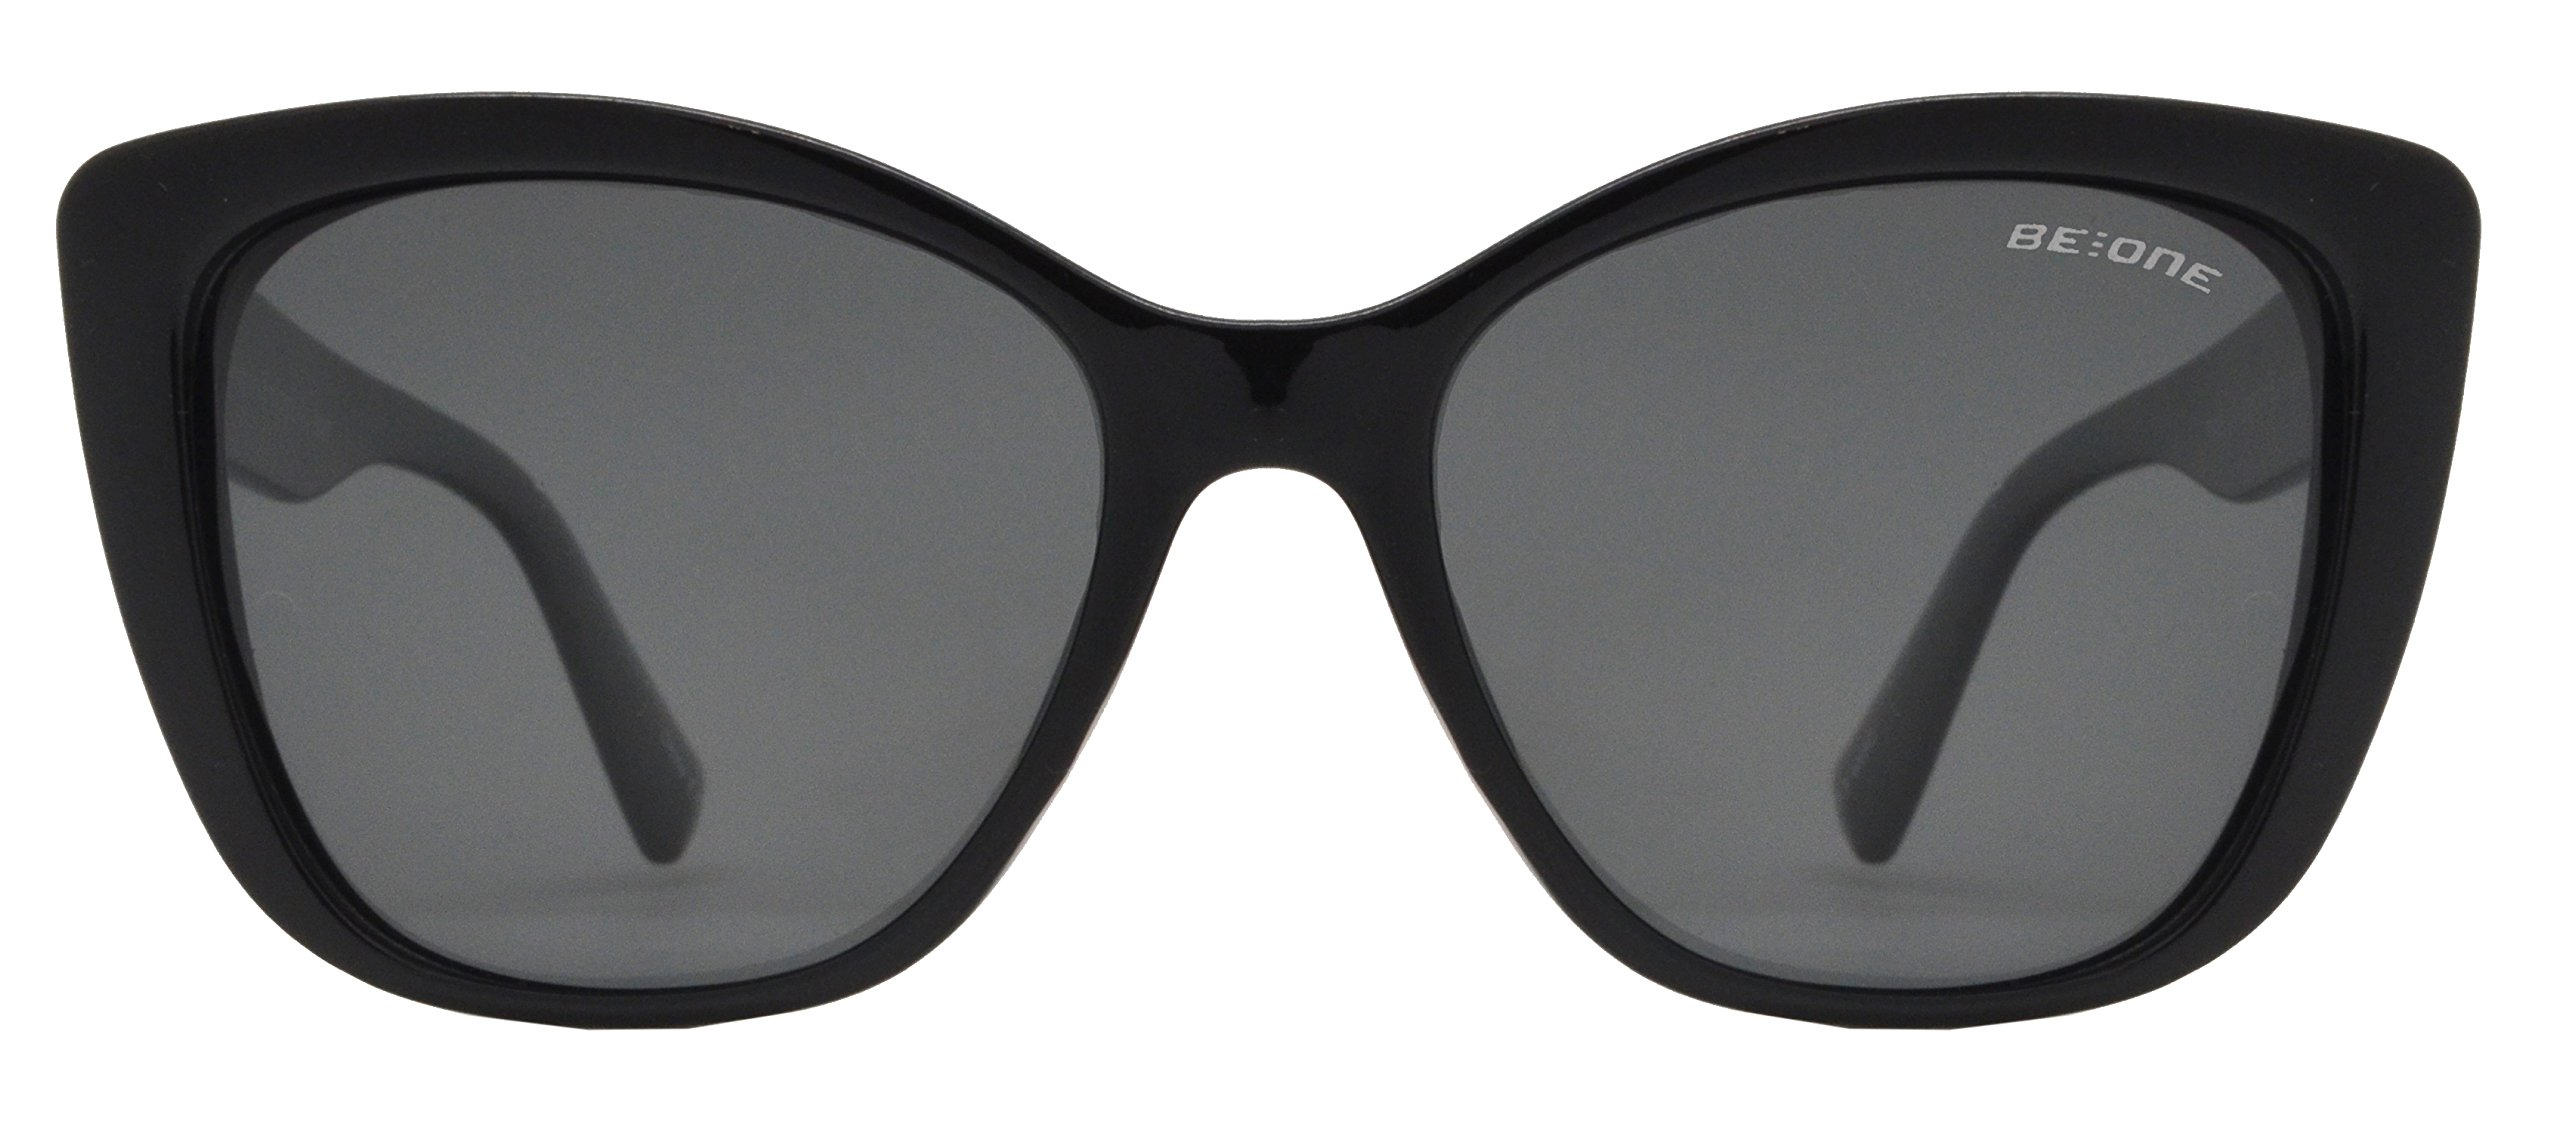 Be One Women Cat Eye Oversize Design Sunglasses- Polarized UV400 Classic Retro Black Frame with Black Lens